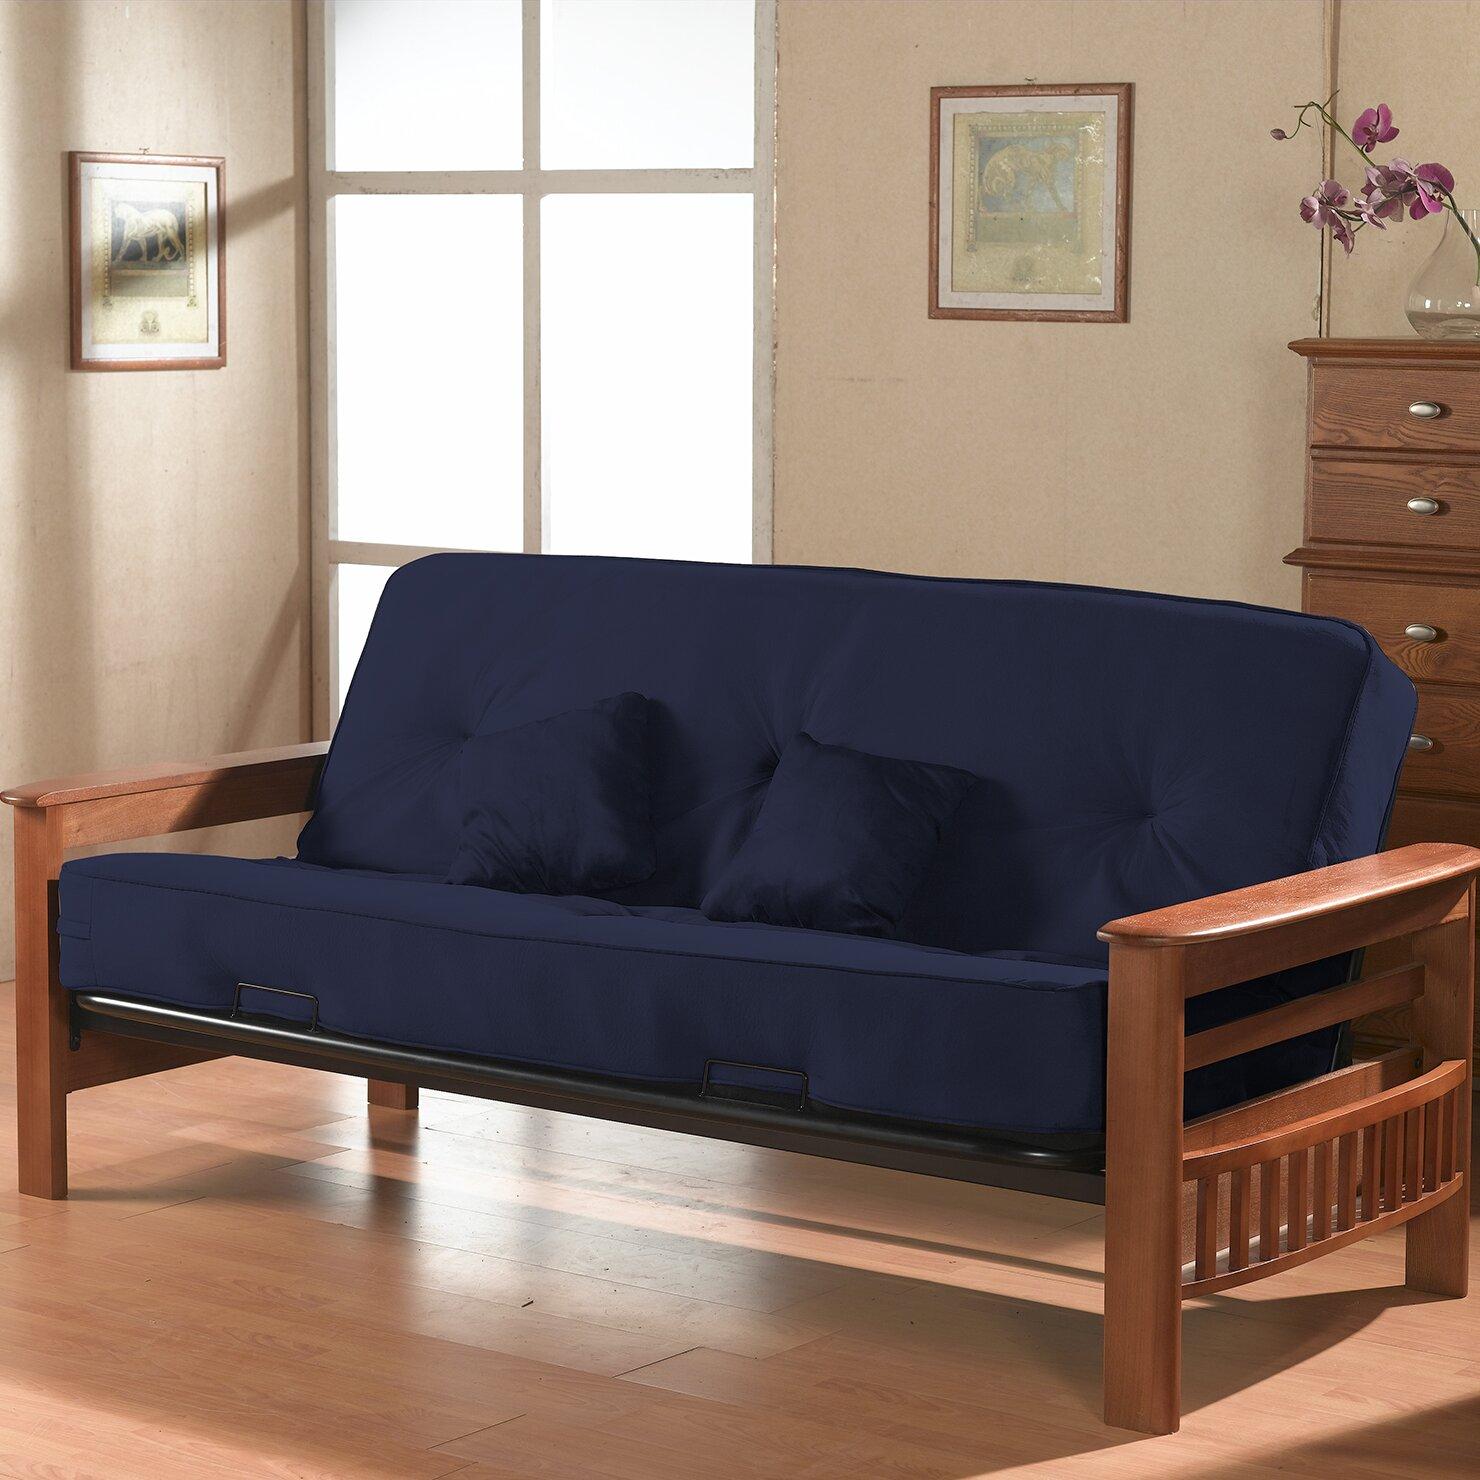 primo international futon